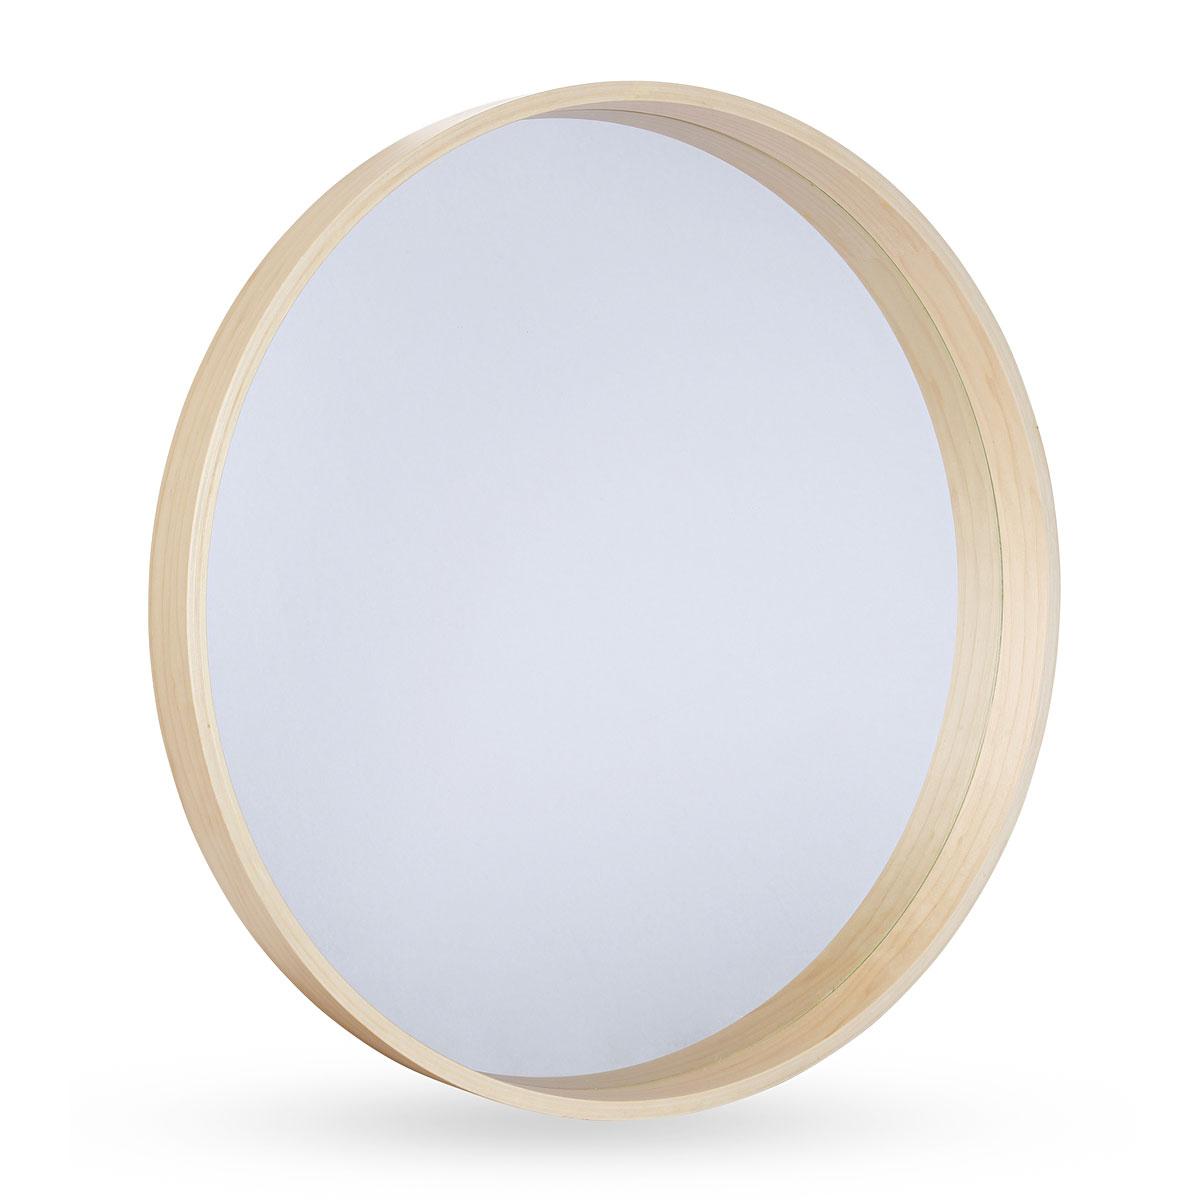 Modern Round Amonra Organic Frame Wall Mirror 25cm Luxe